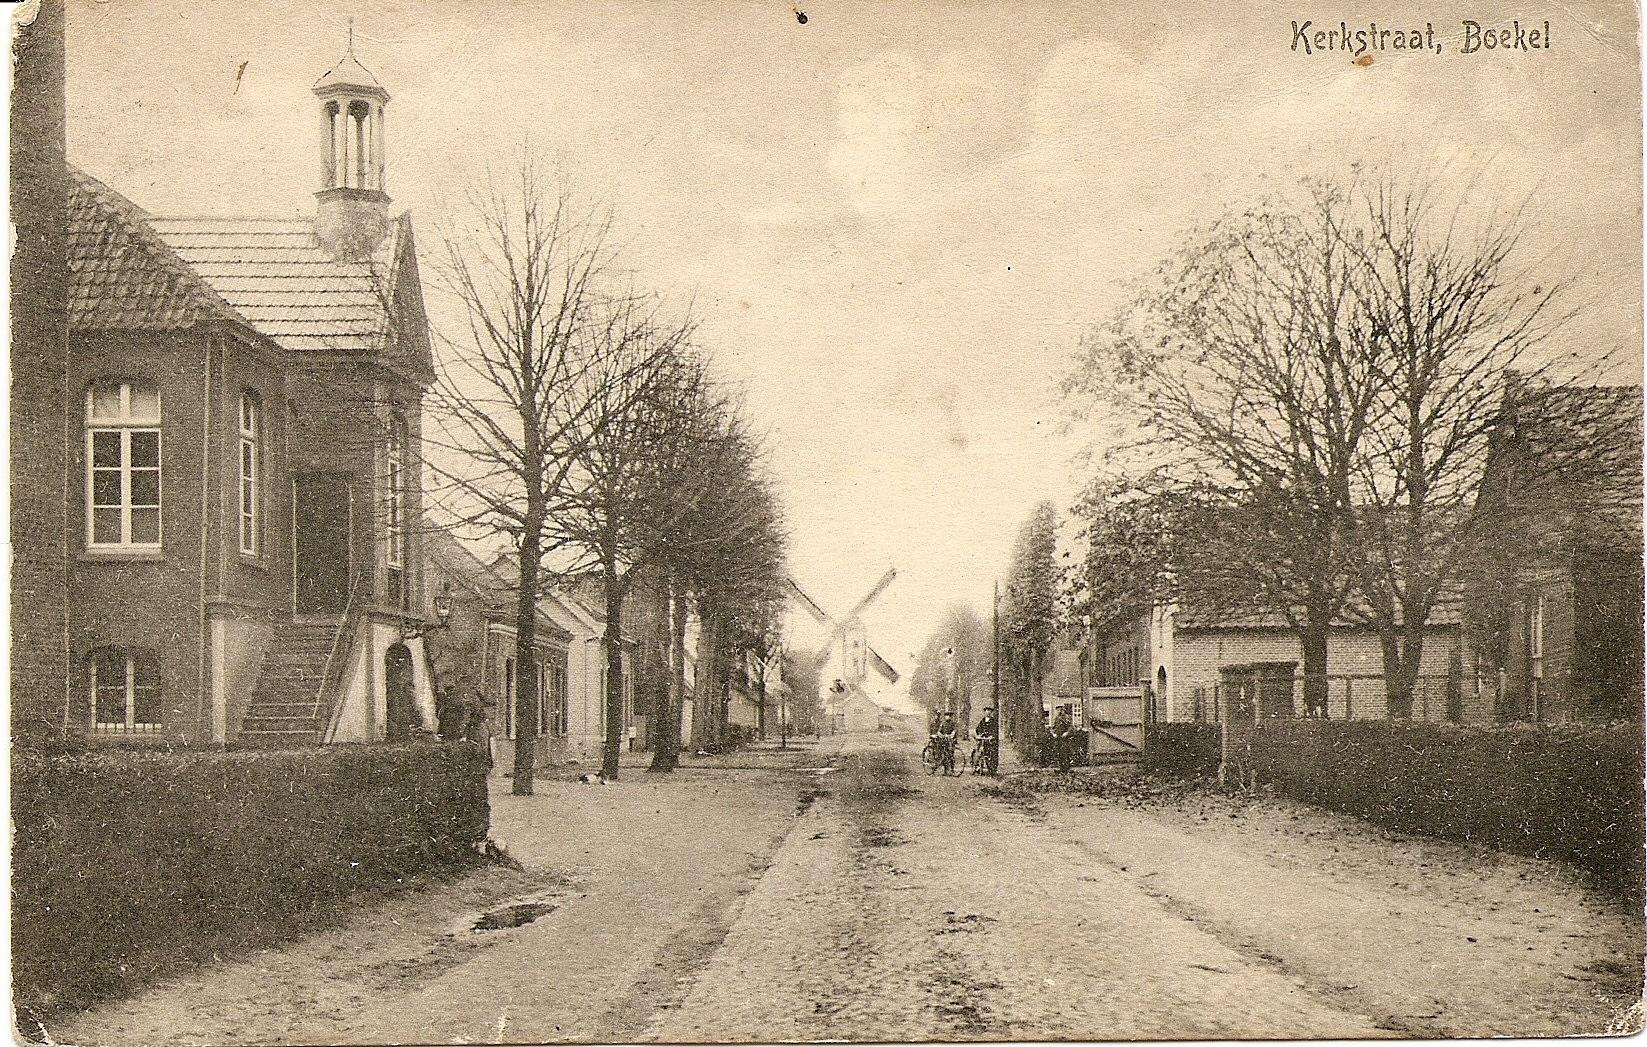 Datering 1930. Kerkstraat.